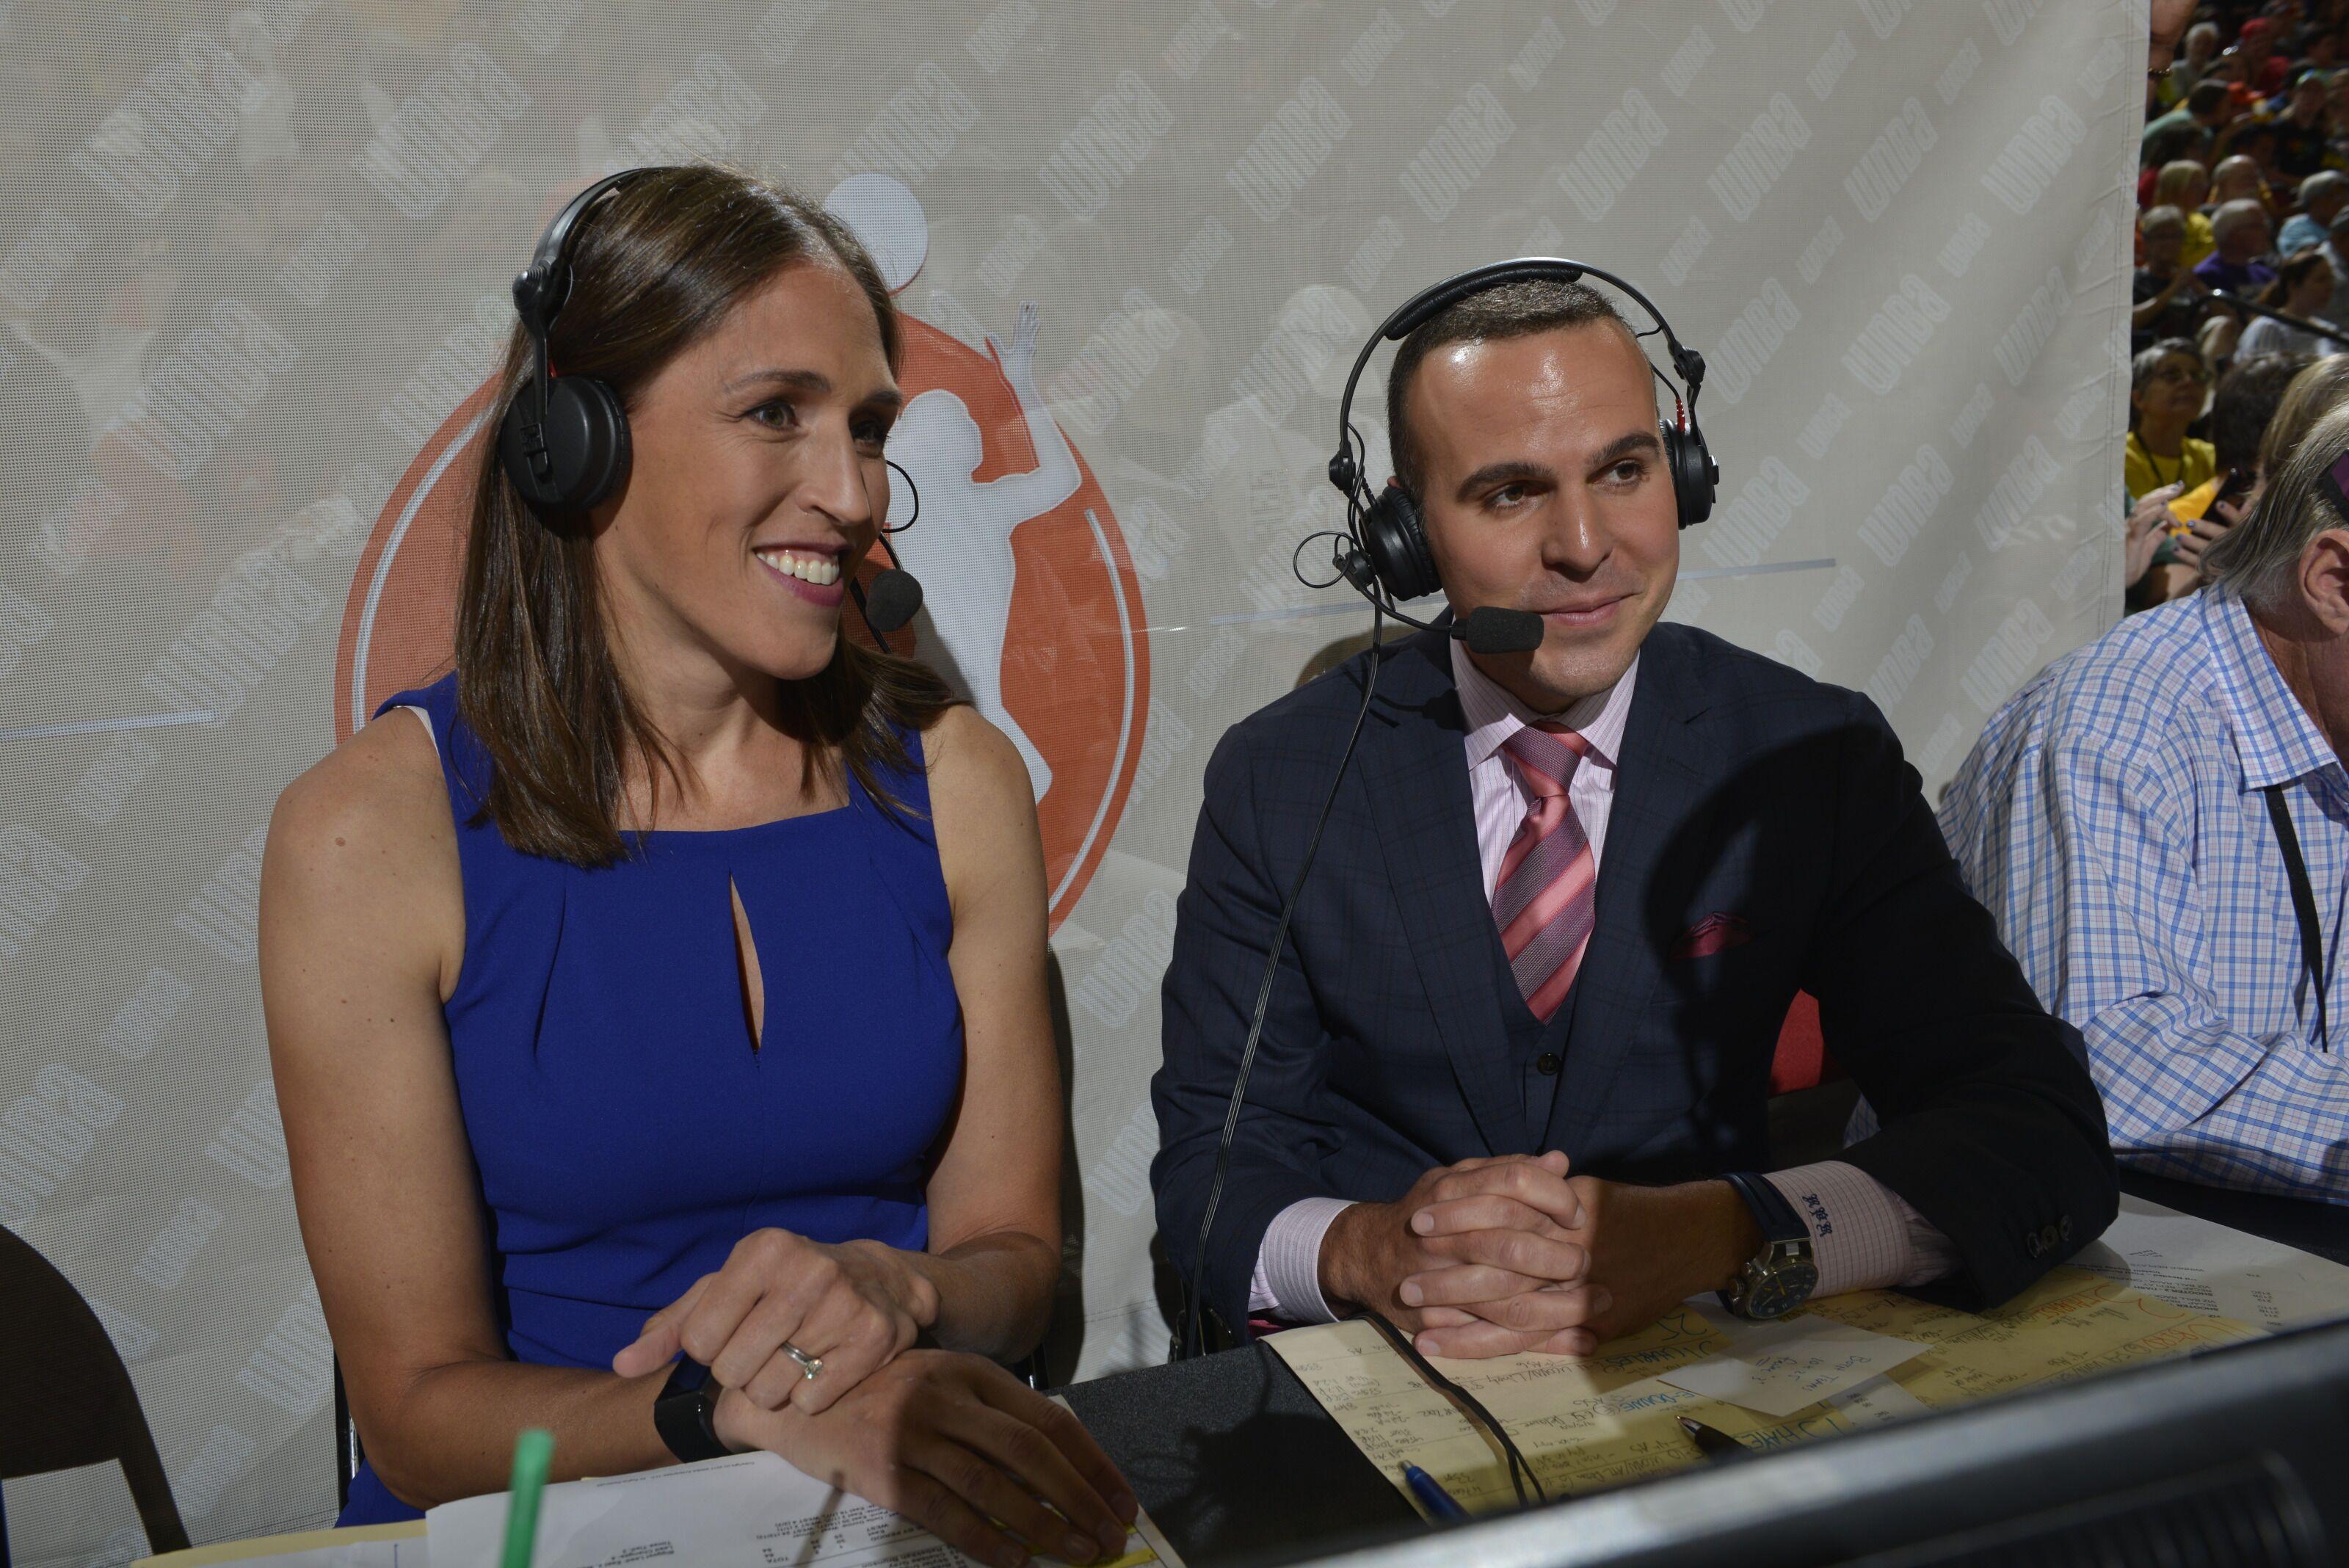 2018 WNBA Finals: How the WNBA Finals ended up on ESPN